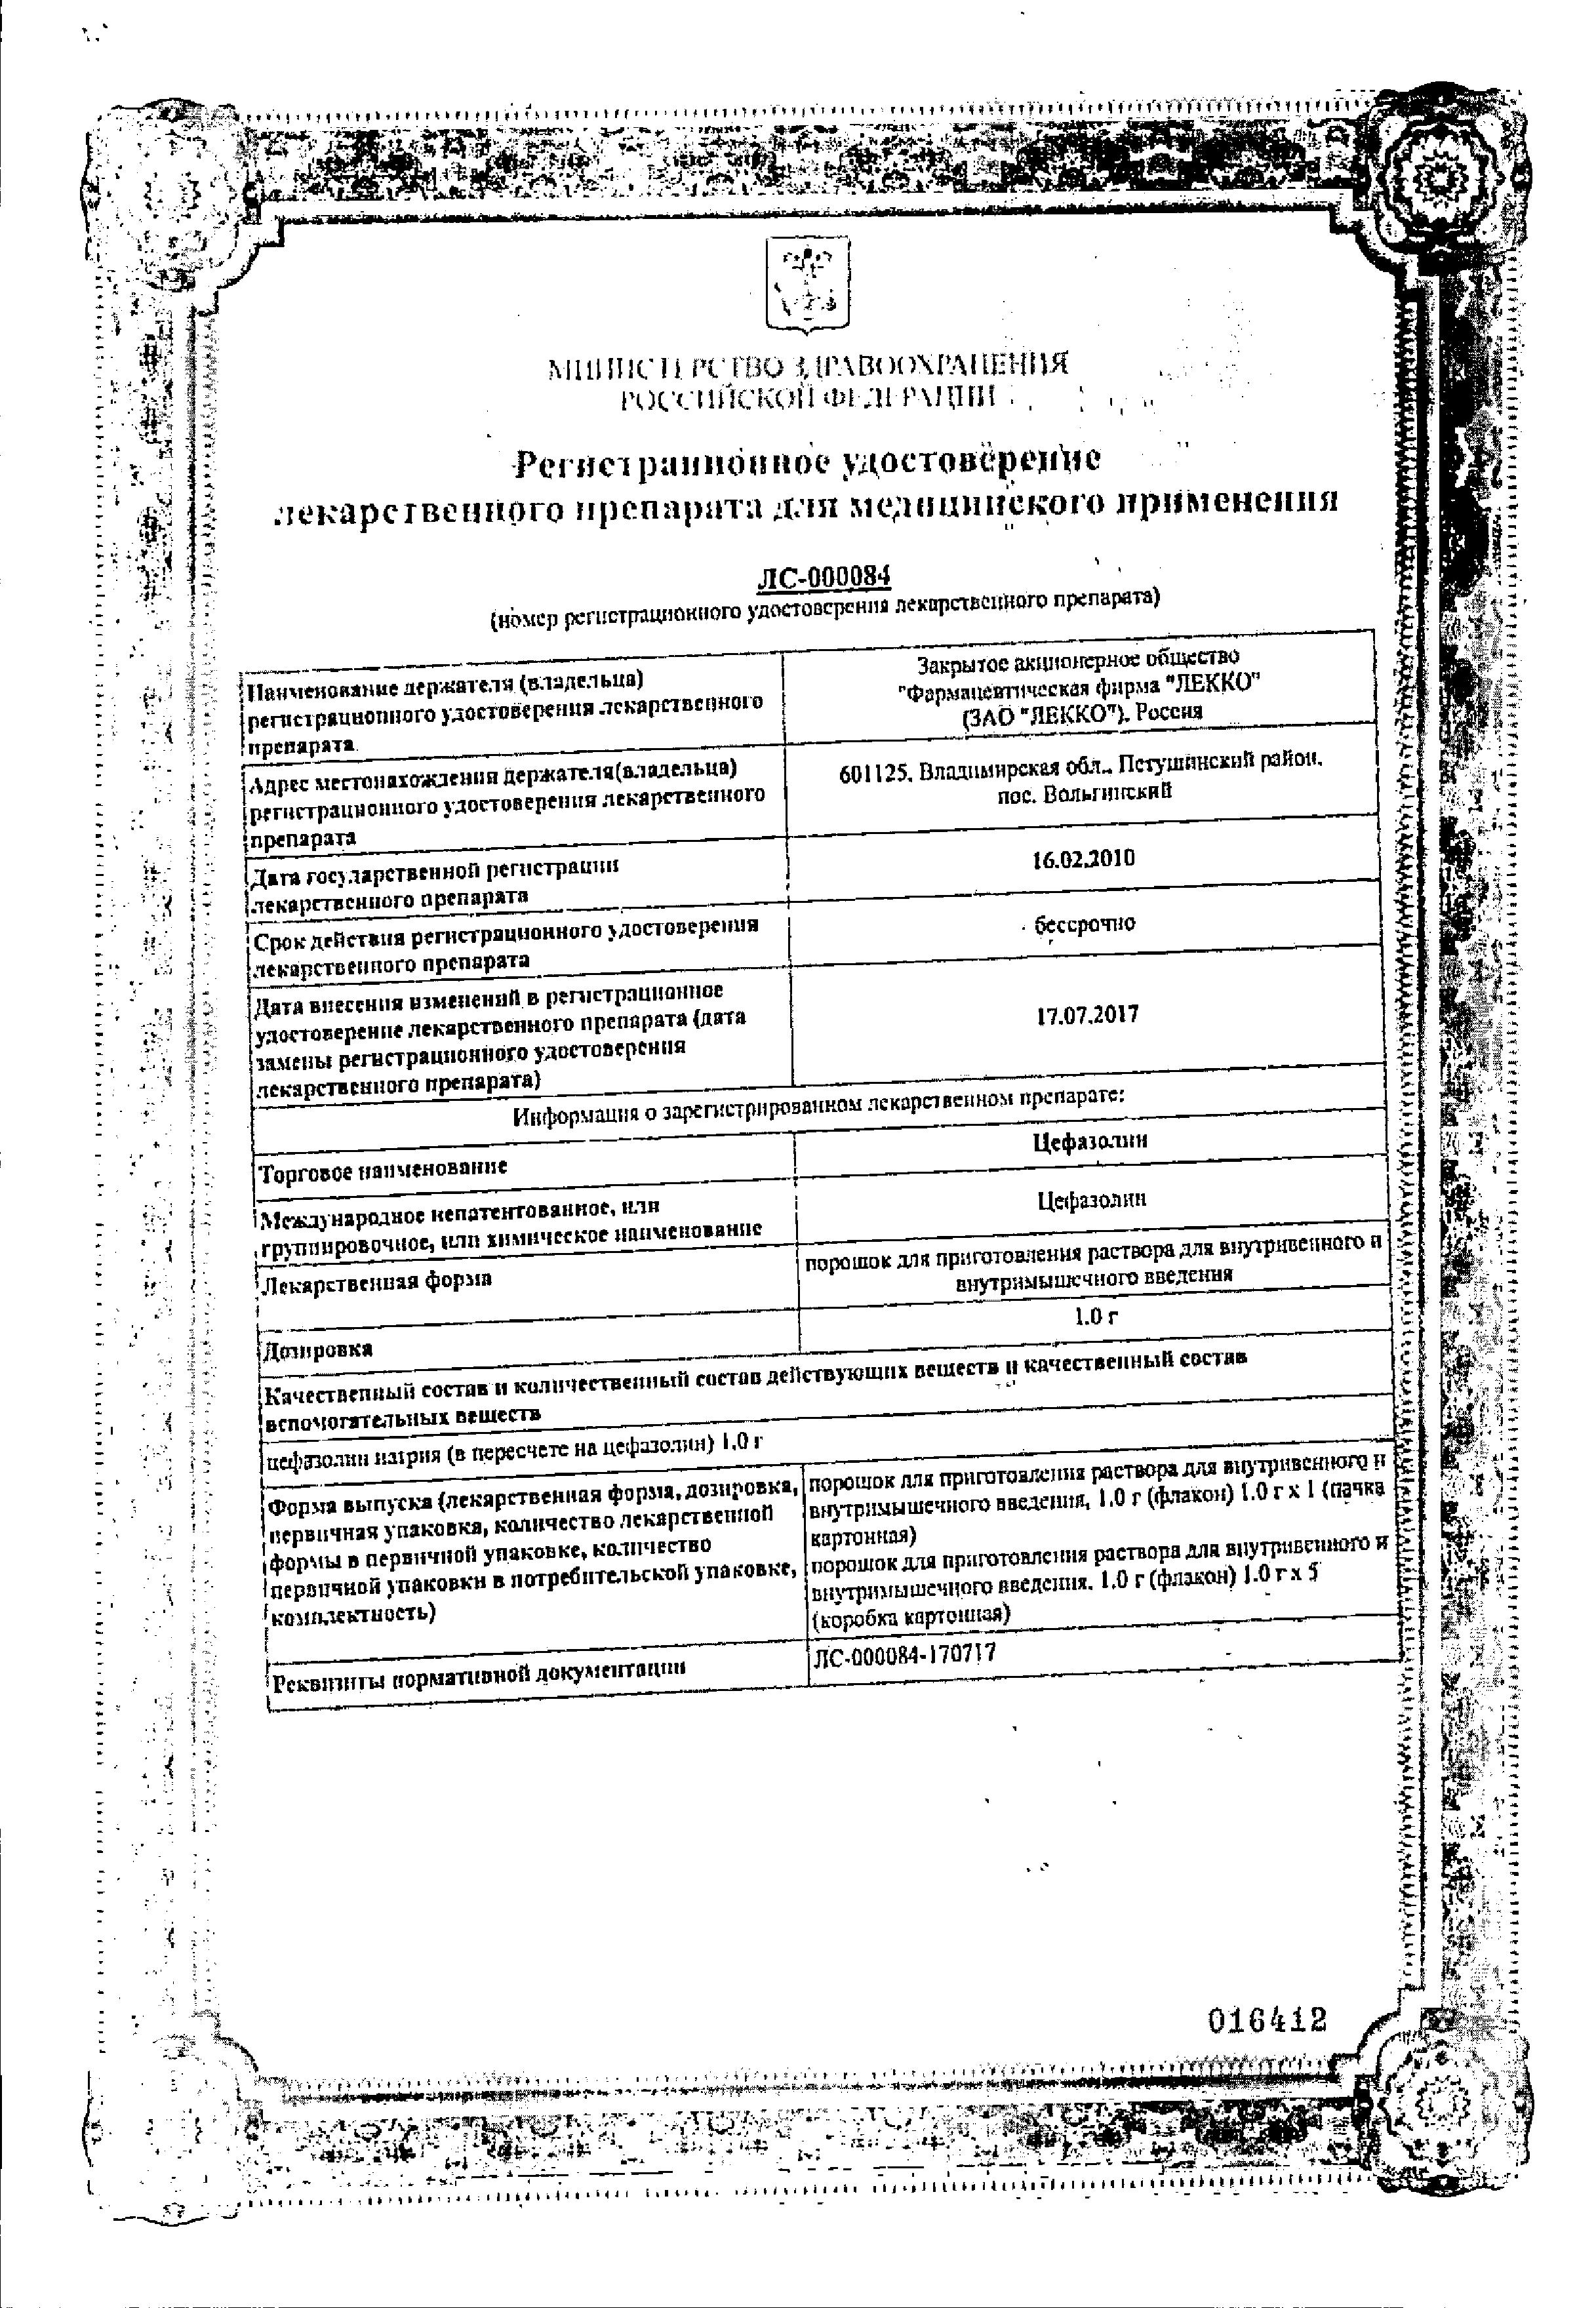 Цефазолин сертификат